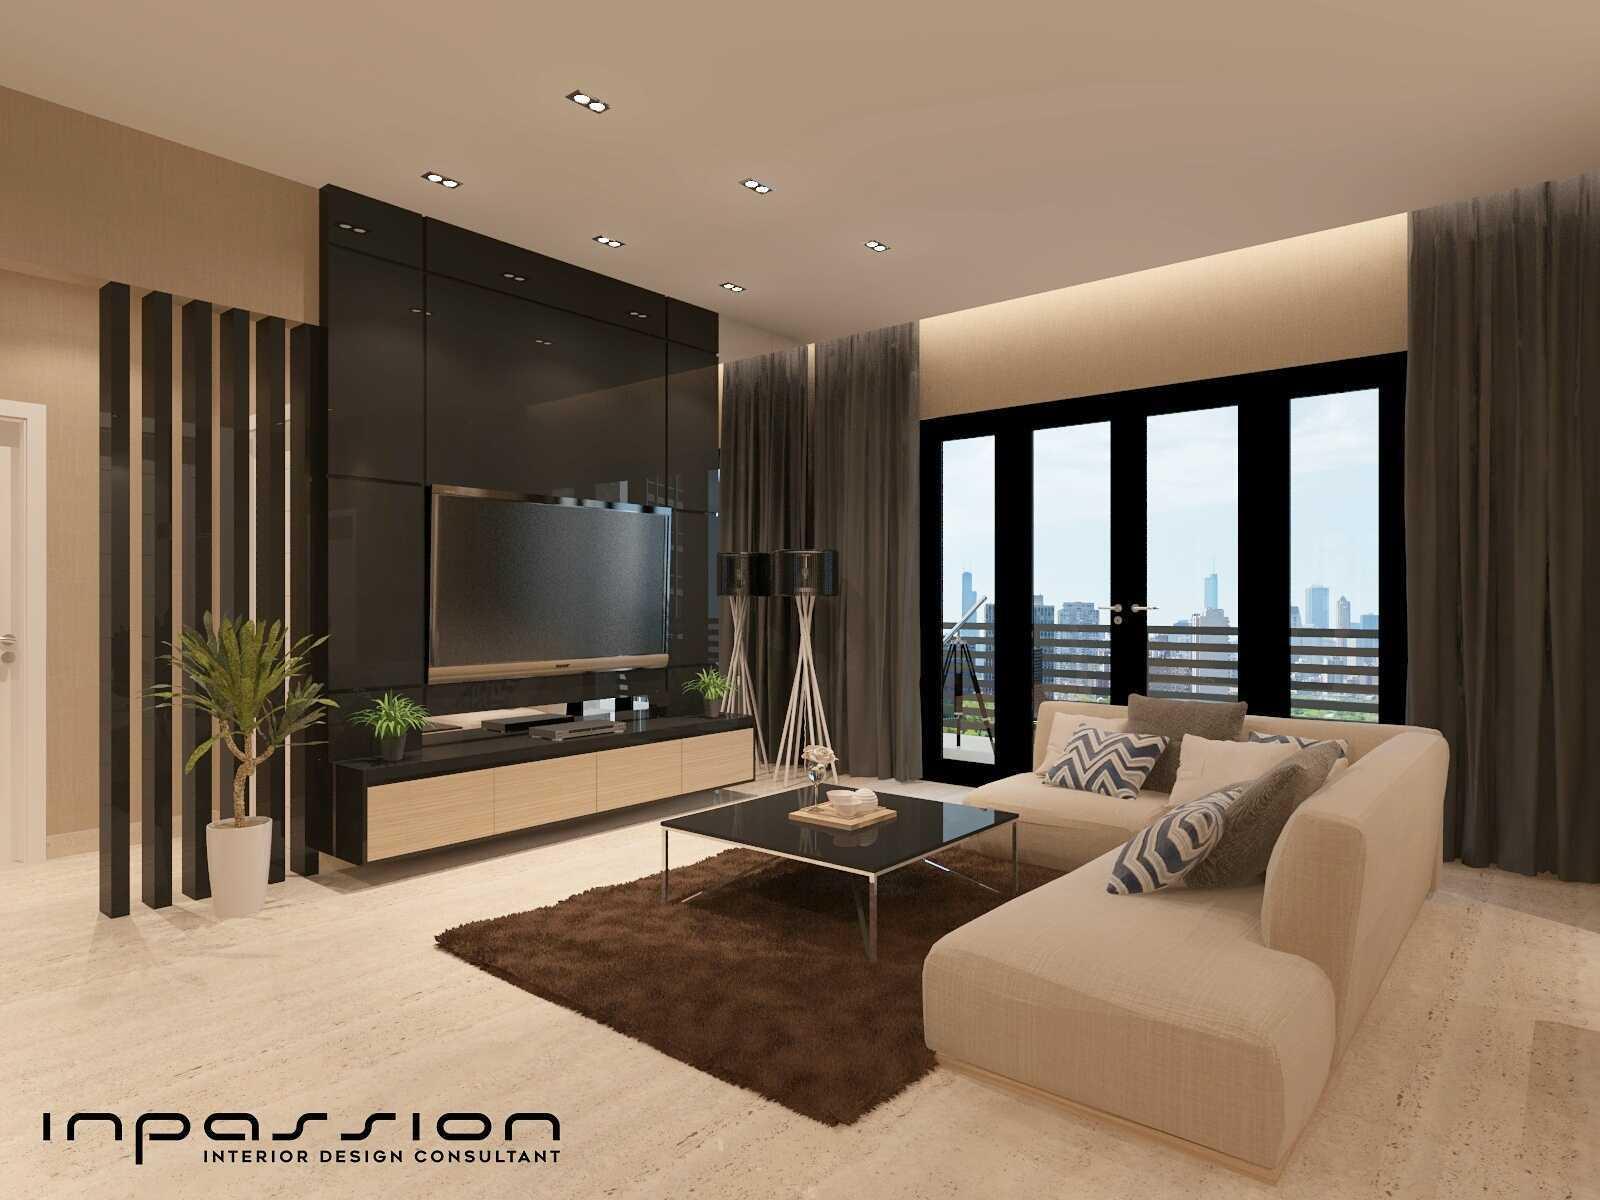 Inpassion Interior Design Apartment Surabaya City, East Java, Indonesia Jakarta Living Room Minimalis,modern  22167